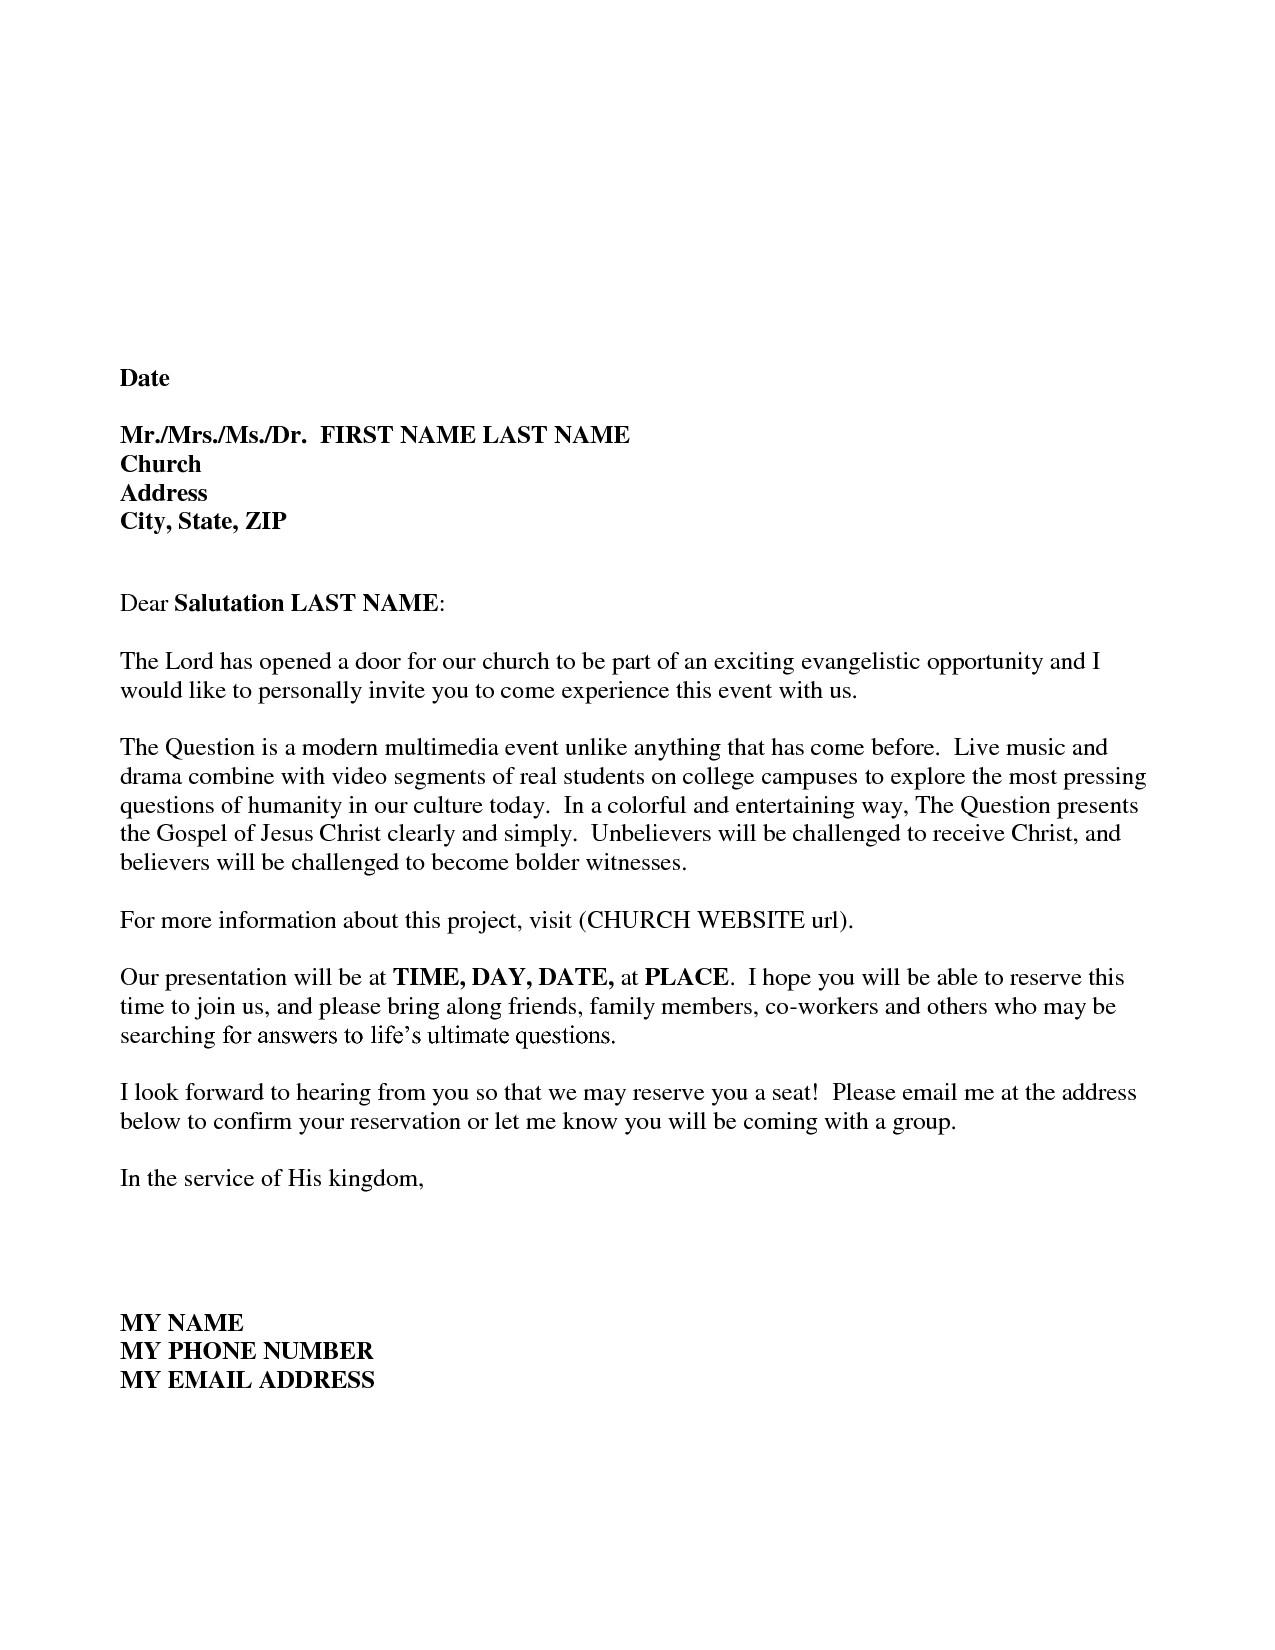 Company Rebrand Letter Template - Sample Invitation Letter Guest Speaker Best Guest Speaker